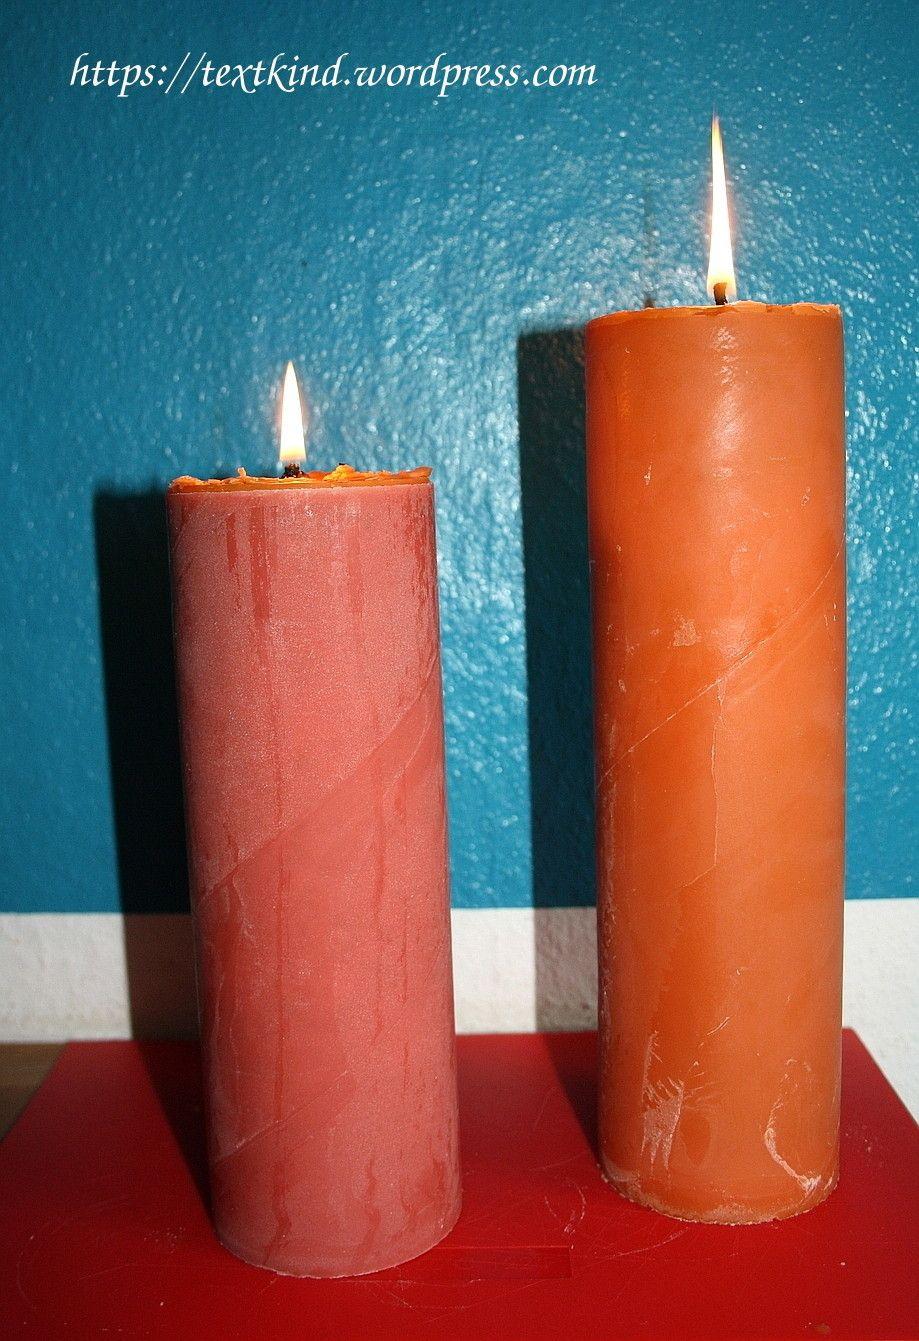 Kerzen Aus Wachsresten Selber Machen Kerzen Giessen Aus Resten